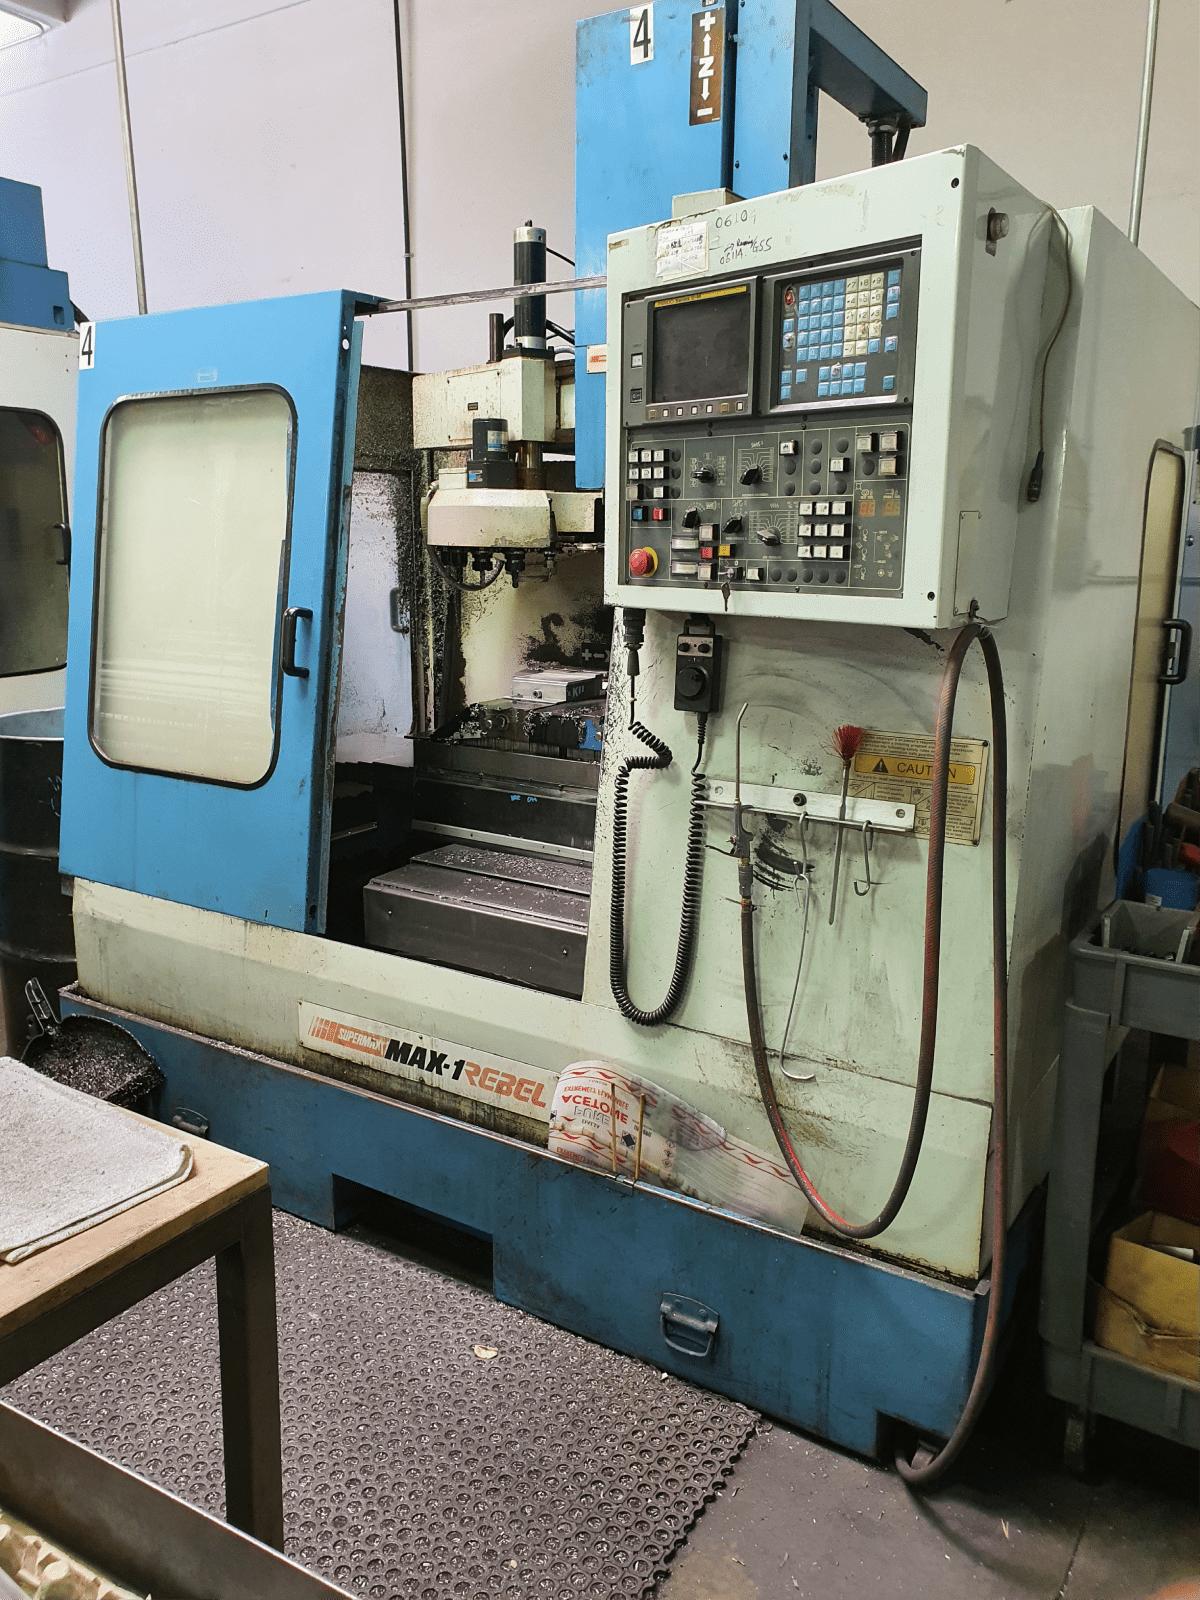 Supermax Max-1 Rebel CNC Mill